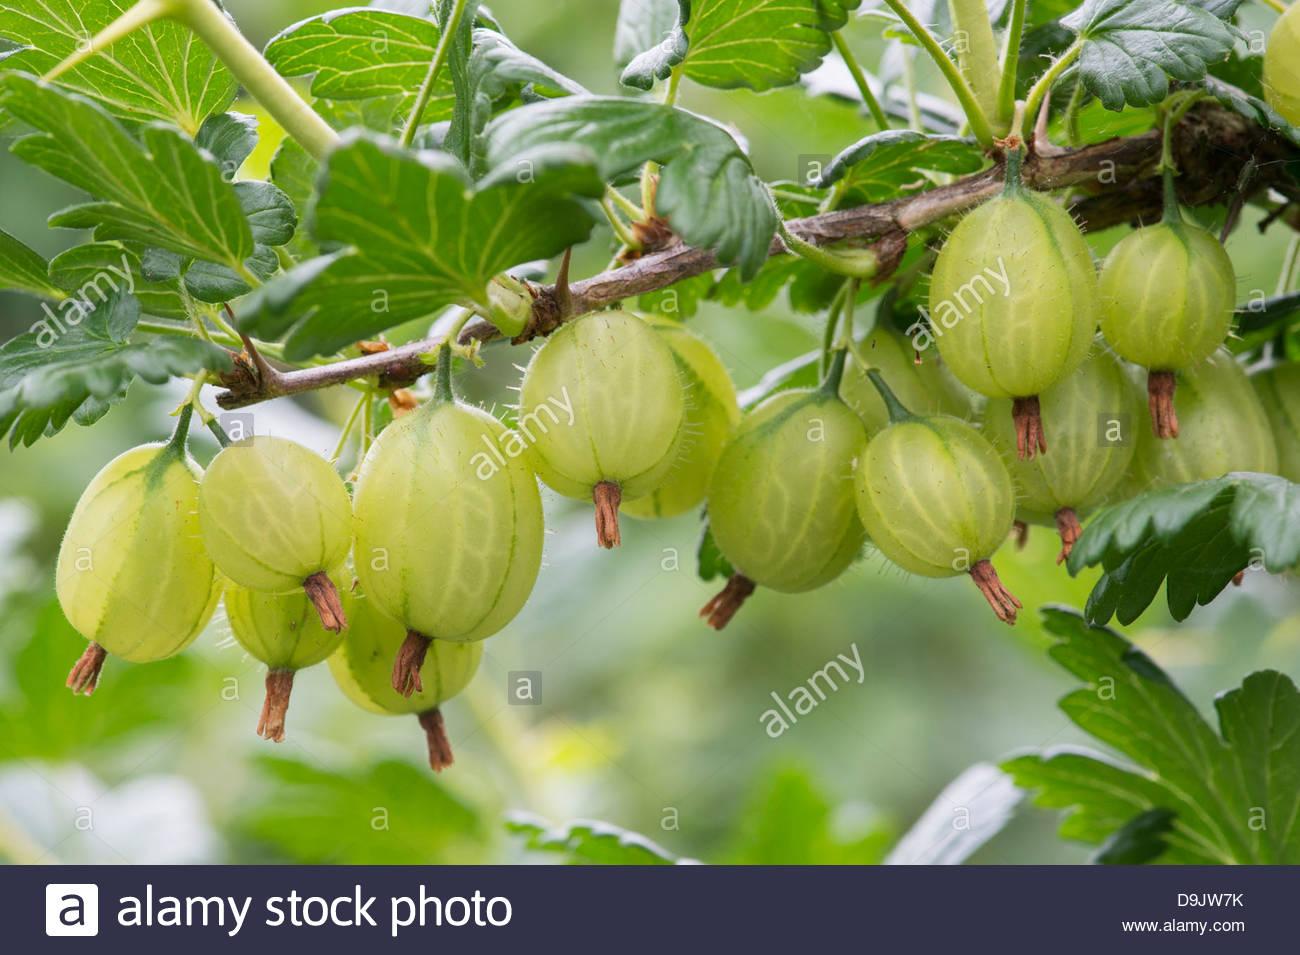 Useful properties of gooseberry. Harvesting gooseberries for the winter 66